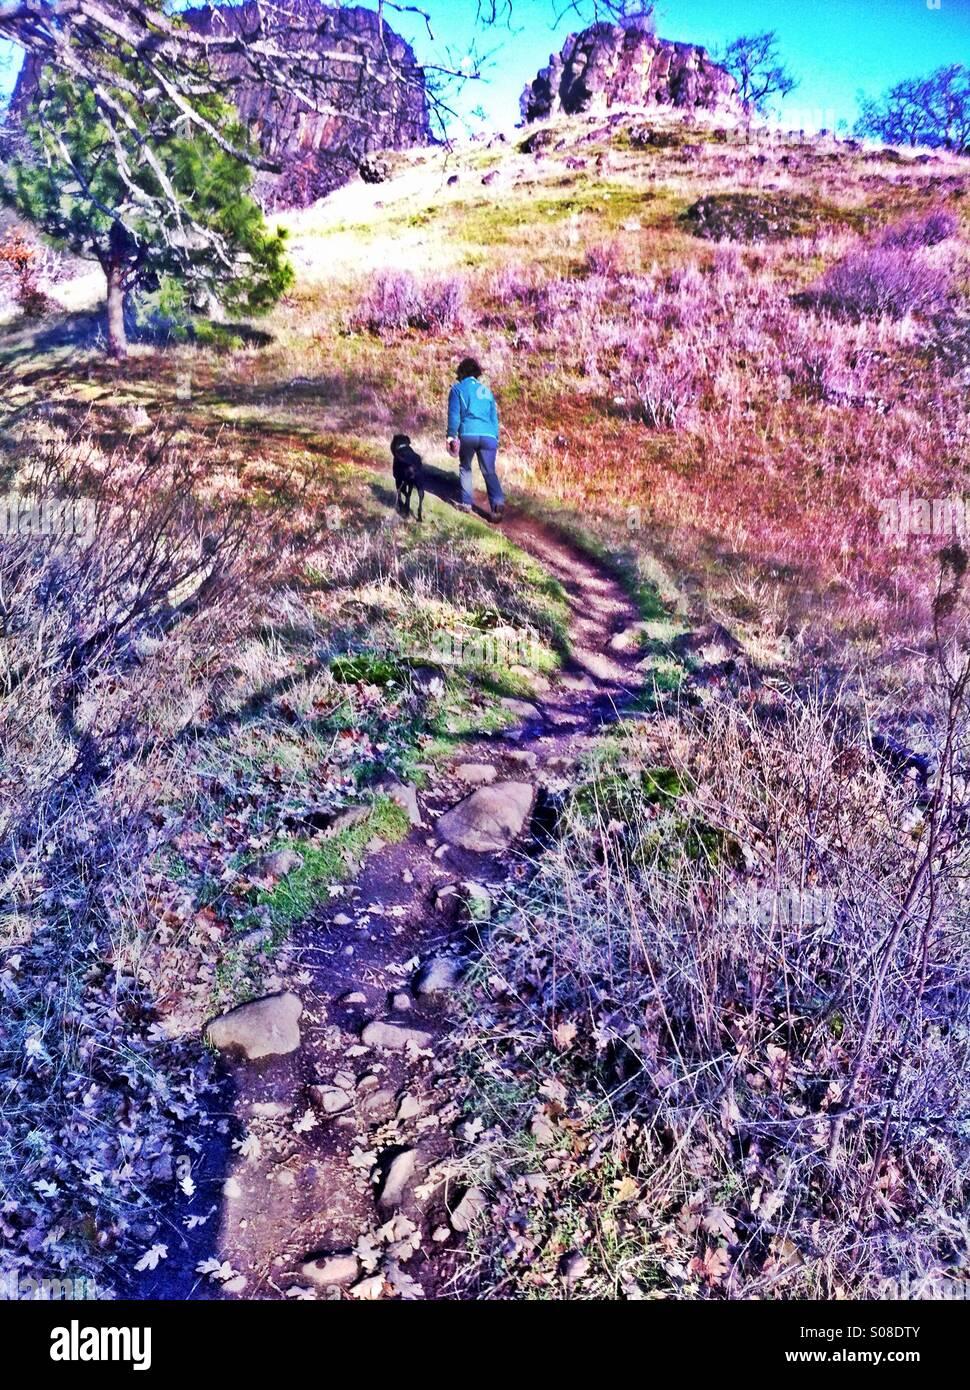 Woman hiking - Stock Image